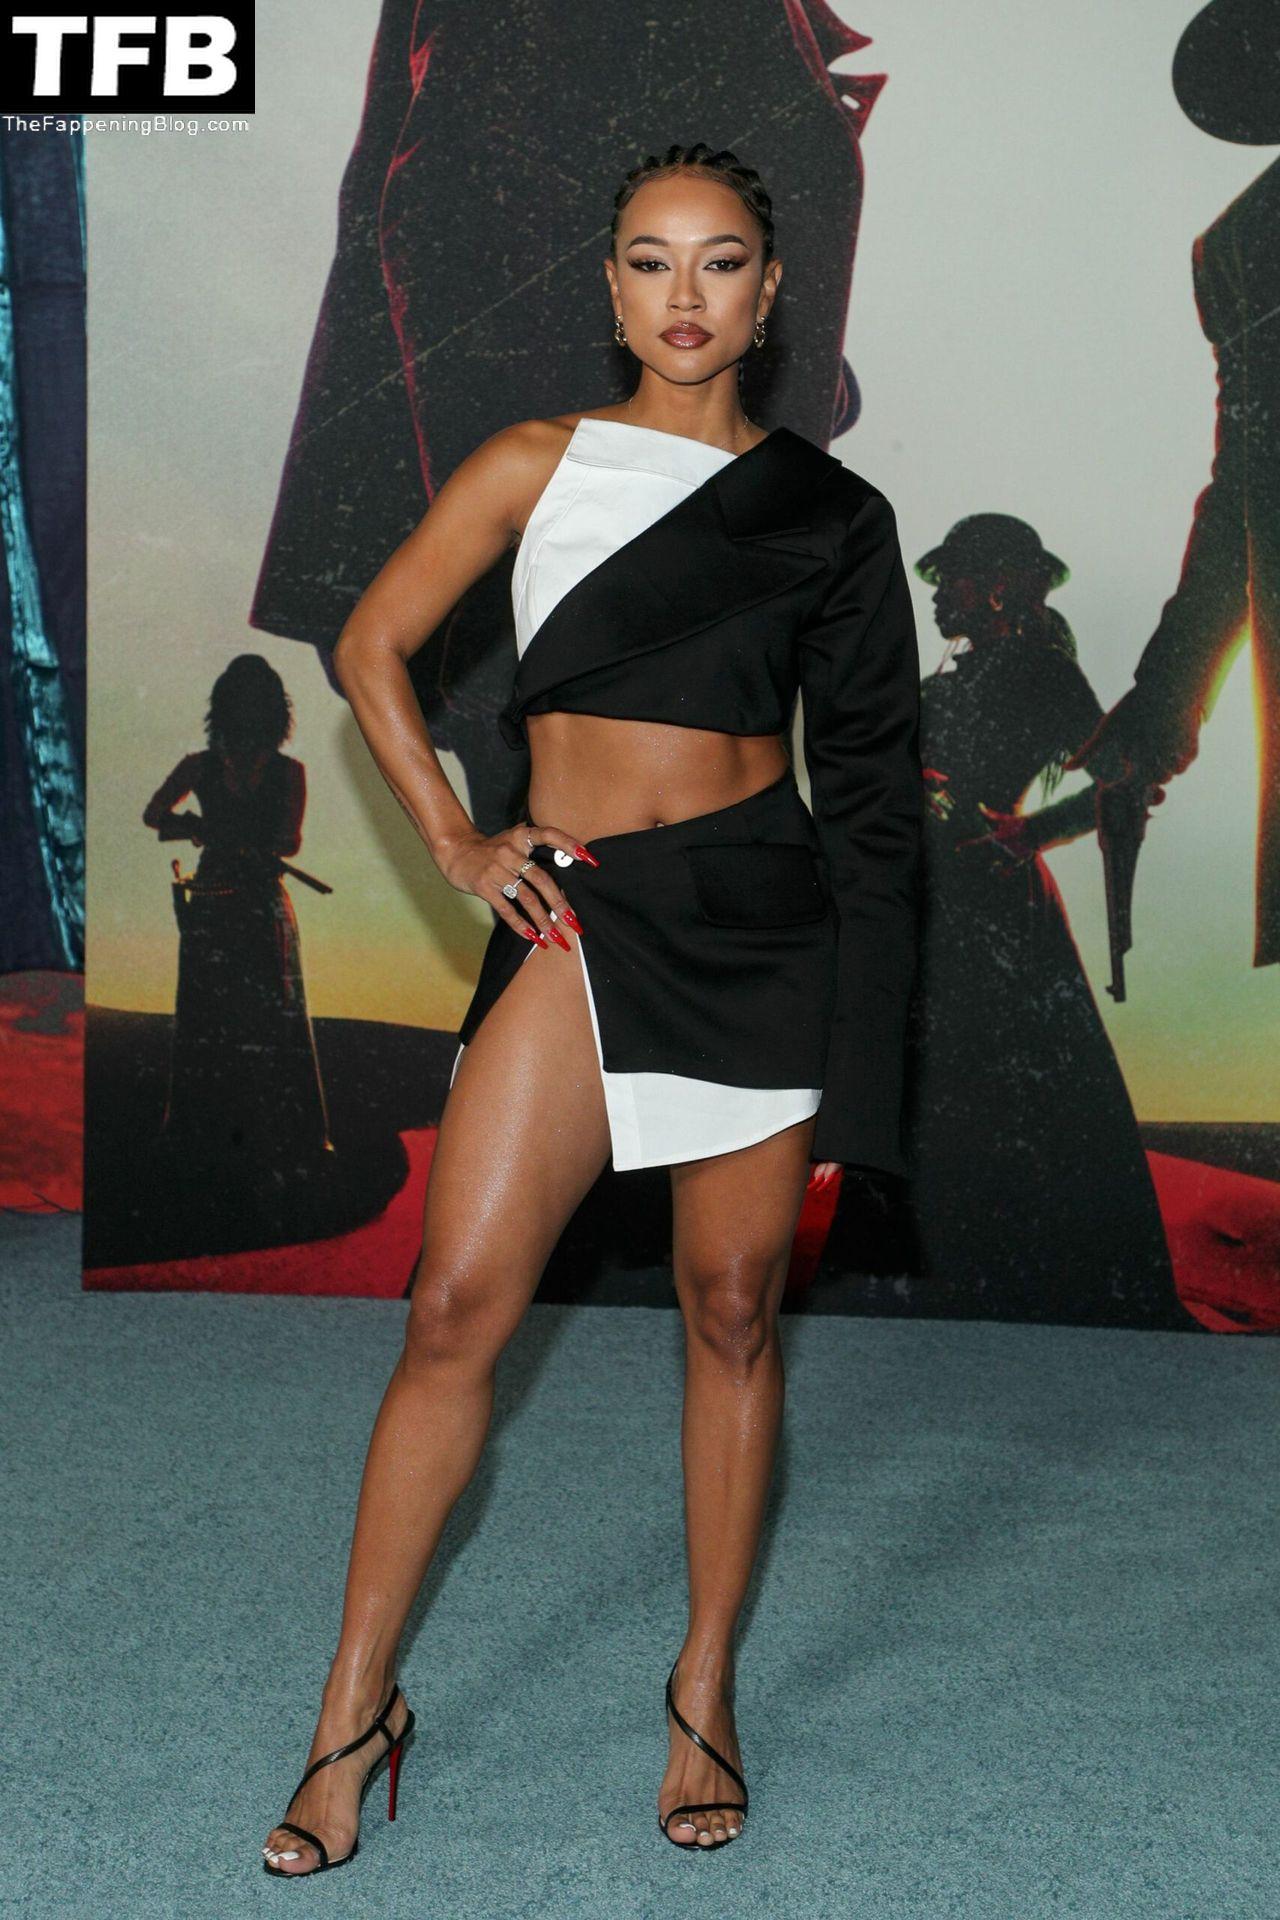 Karrueche-Tran-Sexy-Legs-Upskirt-The-Fappening-Blog-31.jpg